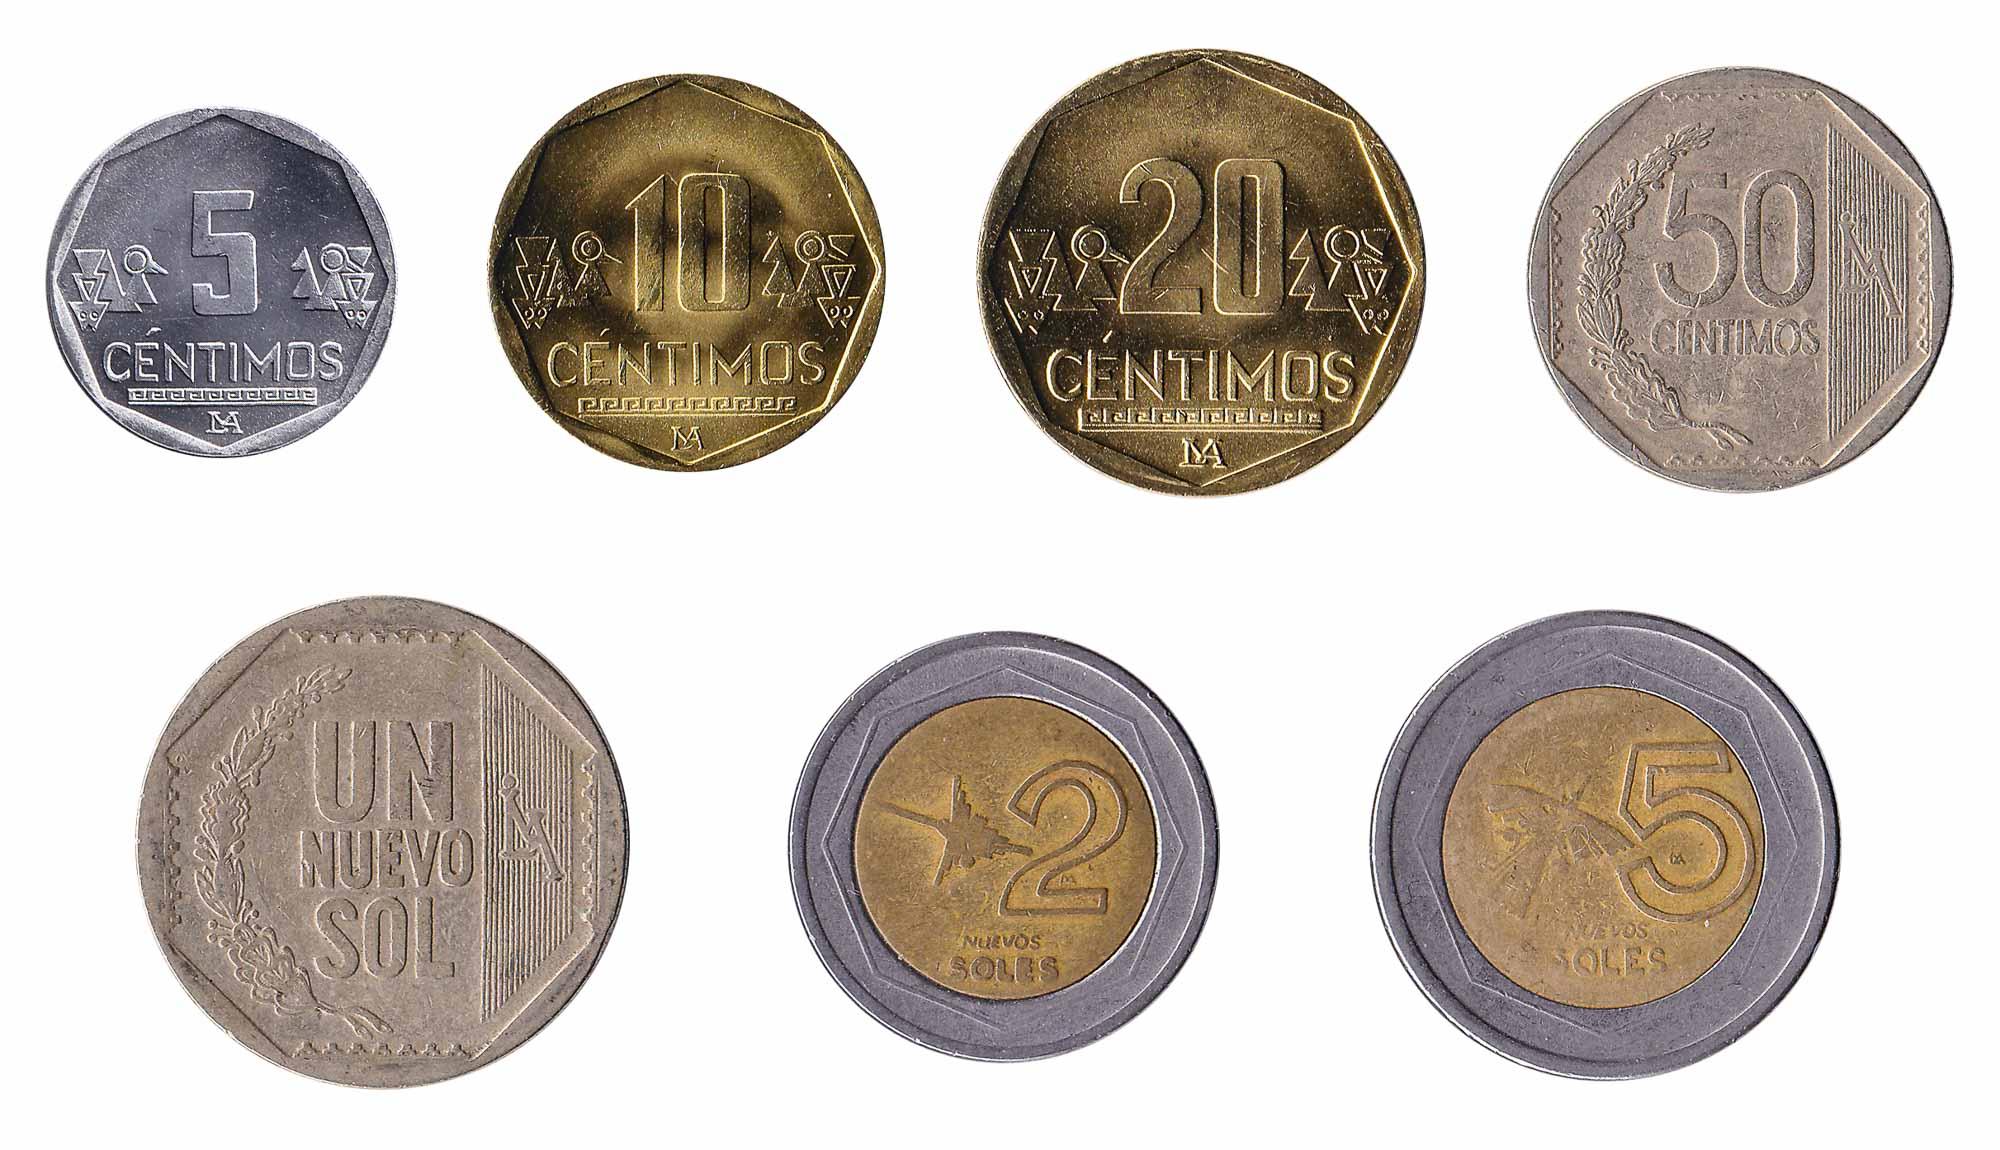 Peruvian sol coins